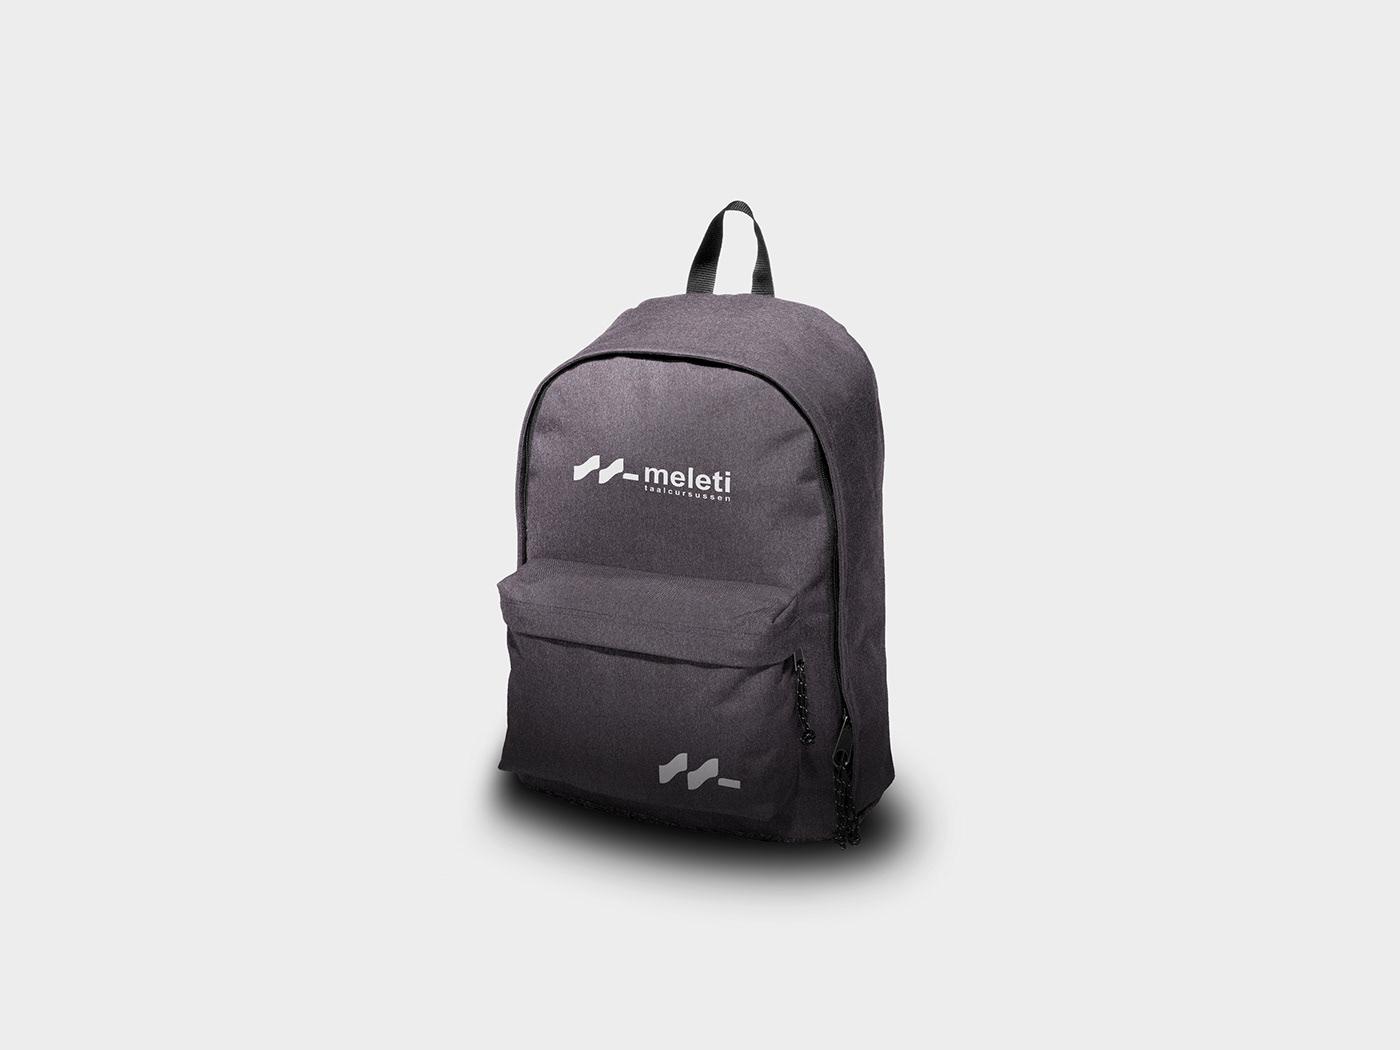 Image may contain: luggage and bags, handbag and backpack